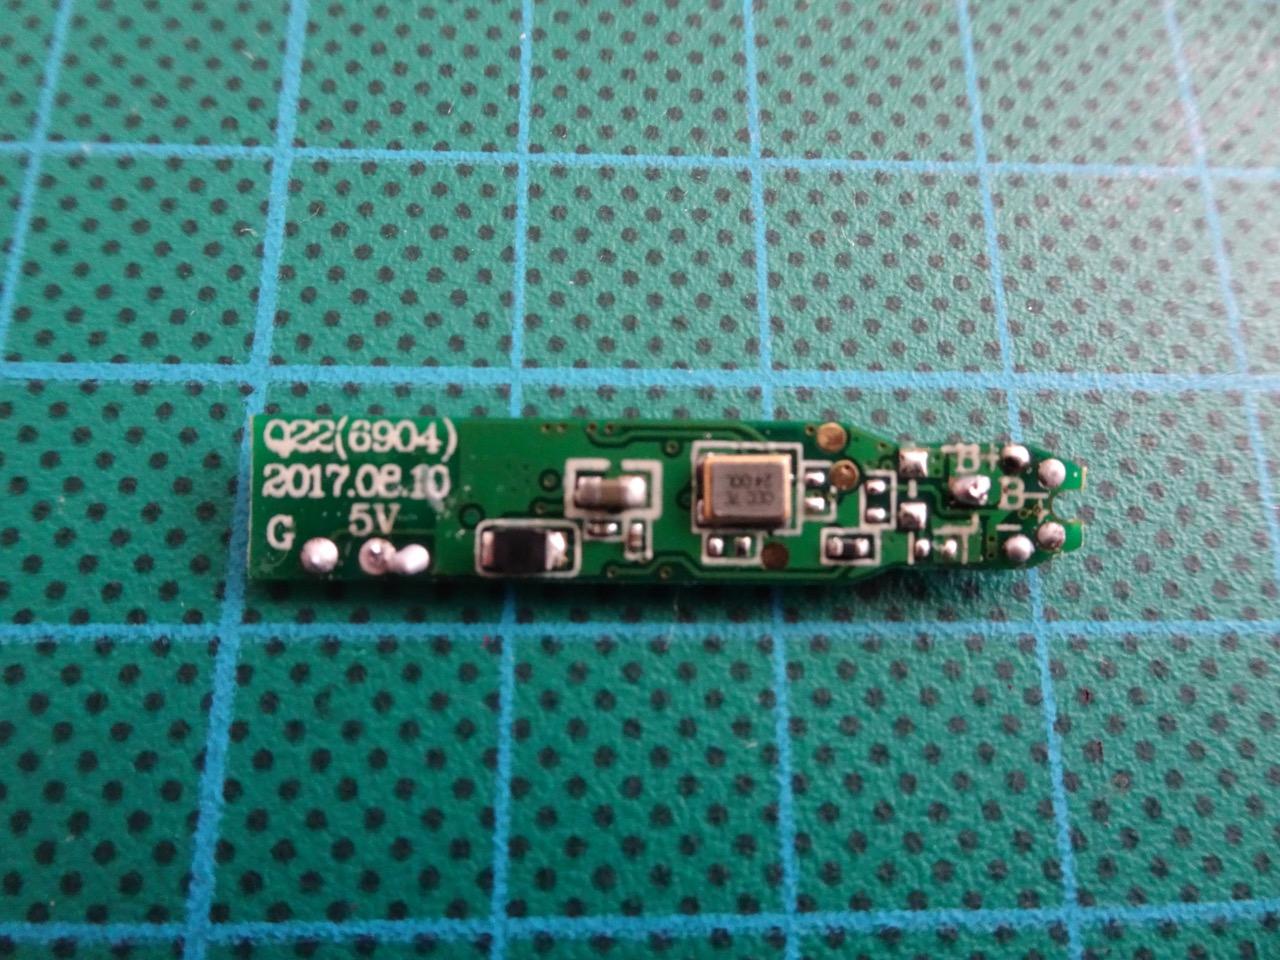 Fake AirPods - HBQ-i7 TWS wireless headset teardown | Igor